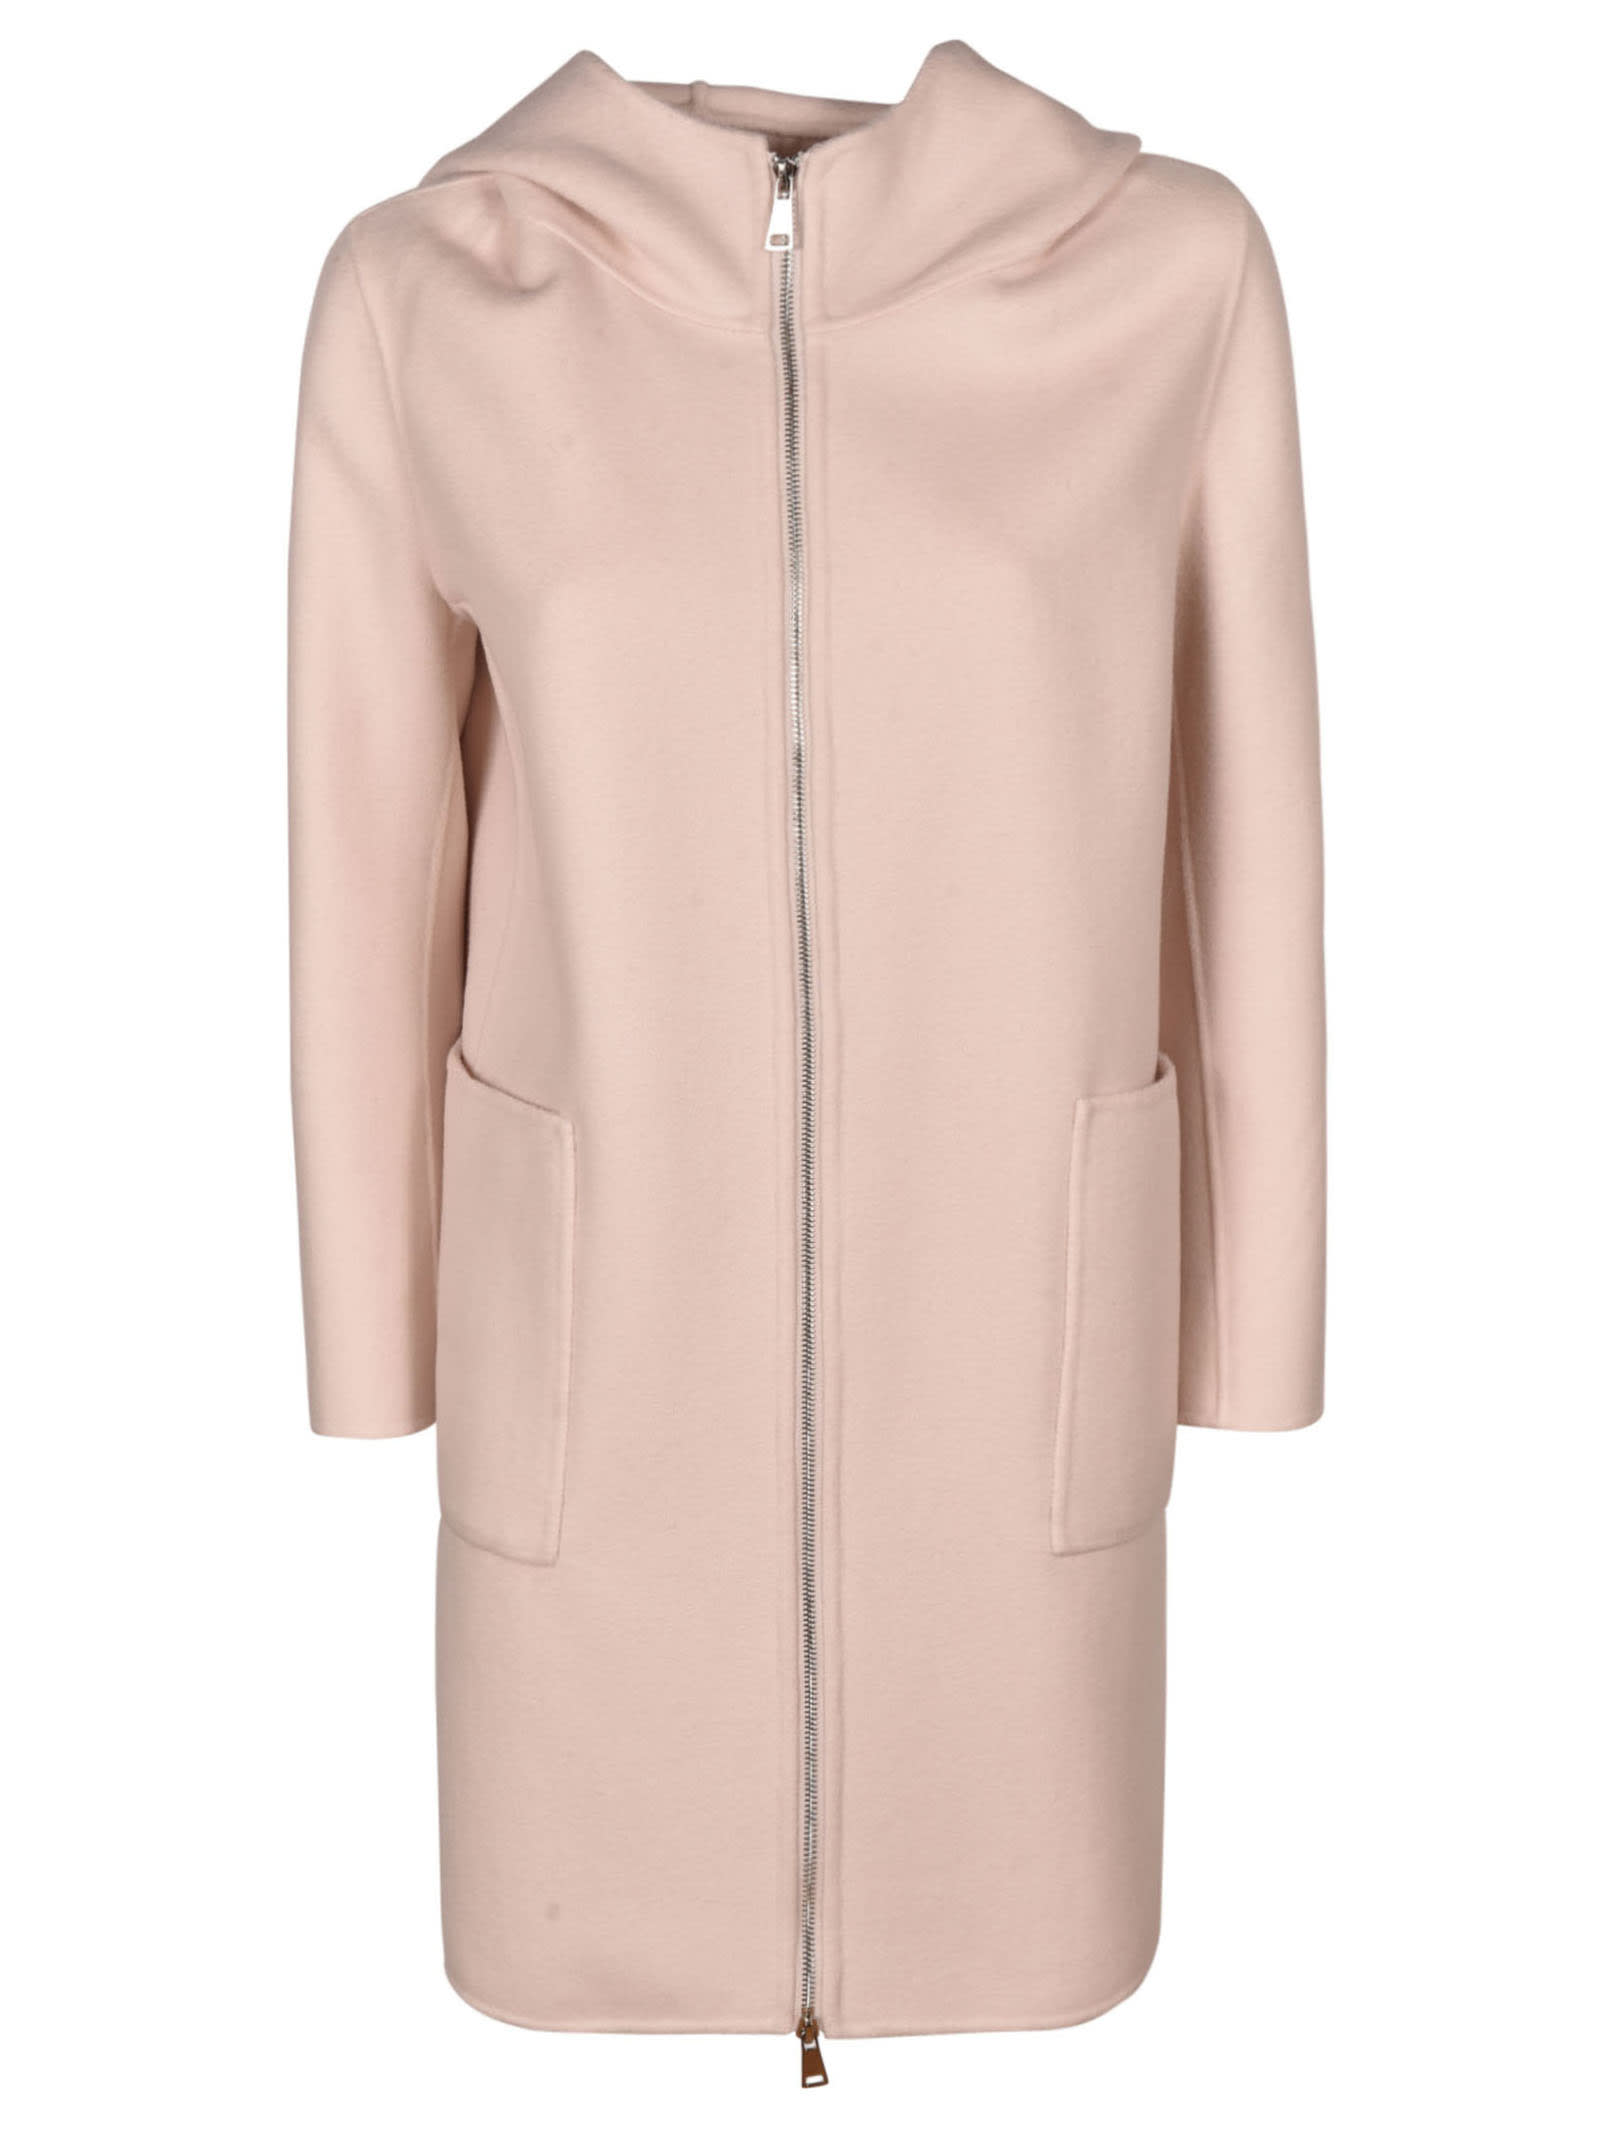 Fur Vest Applique Hooded Coat